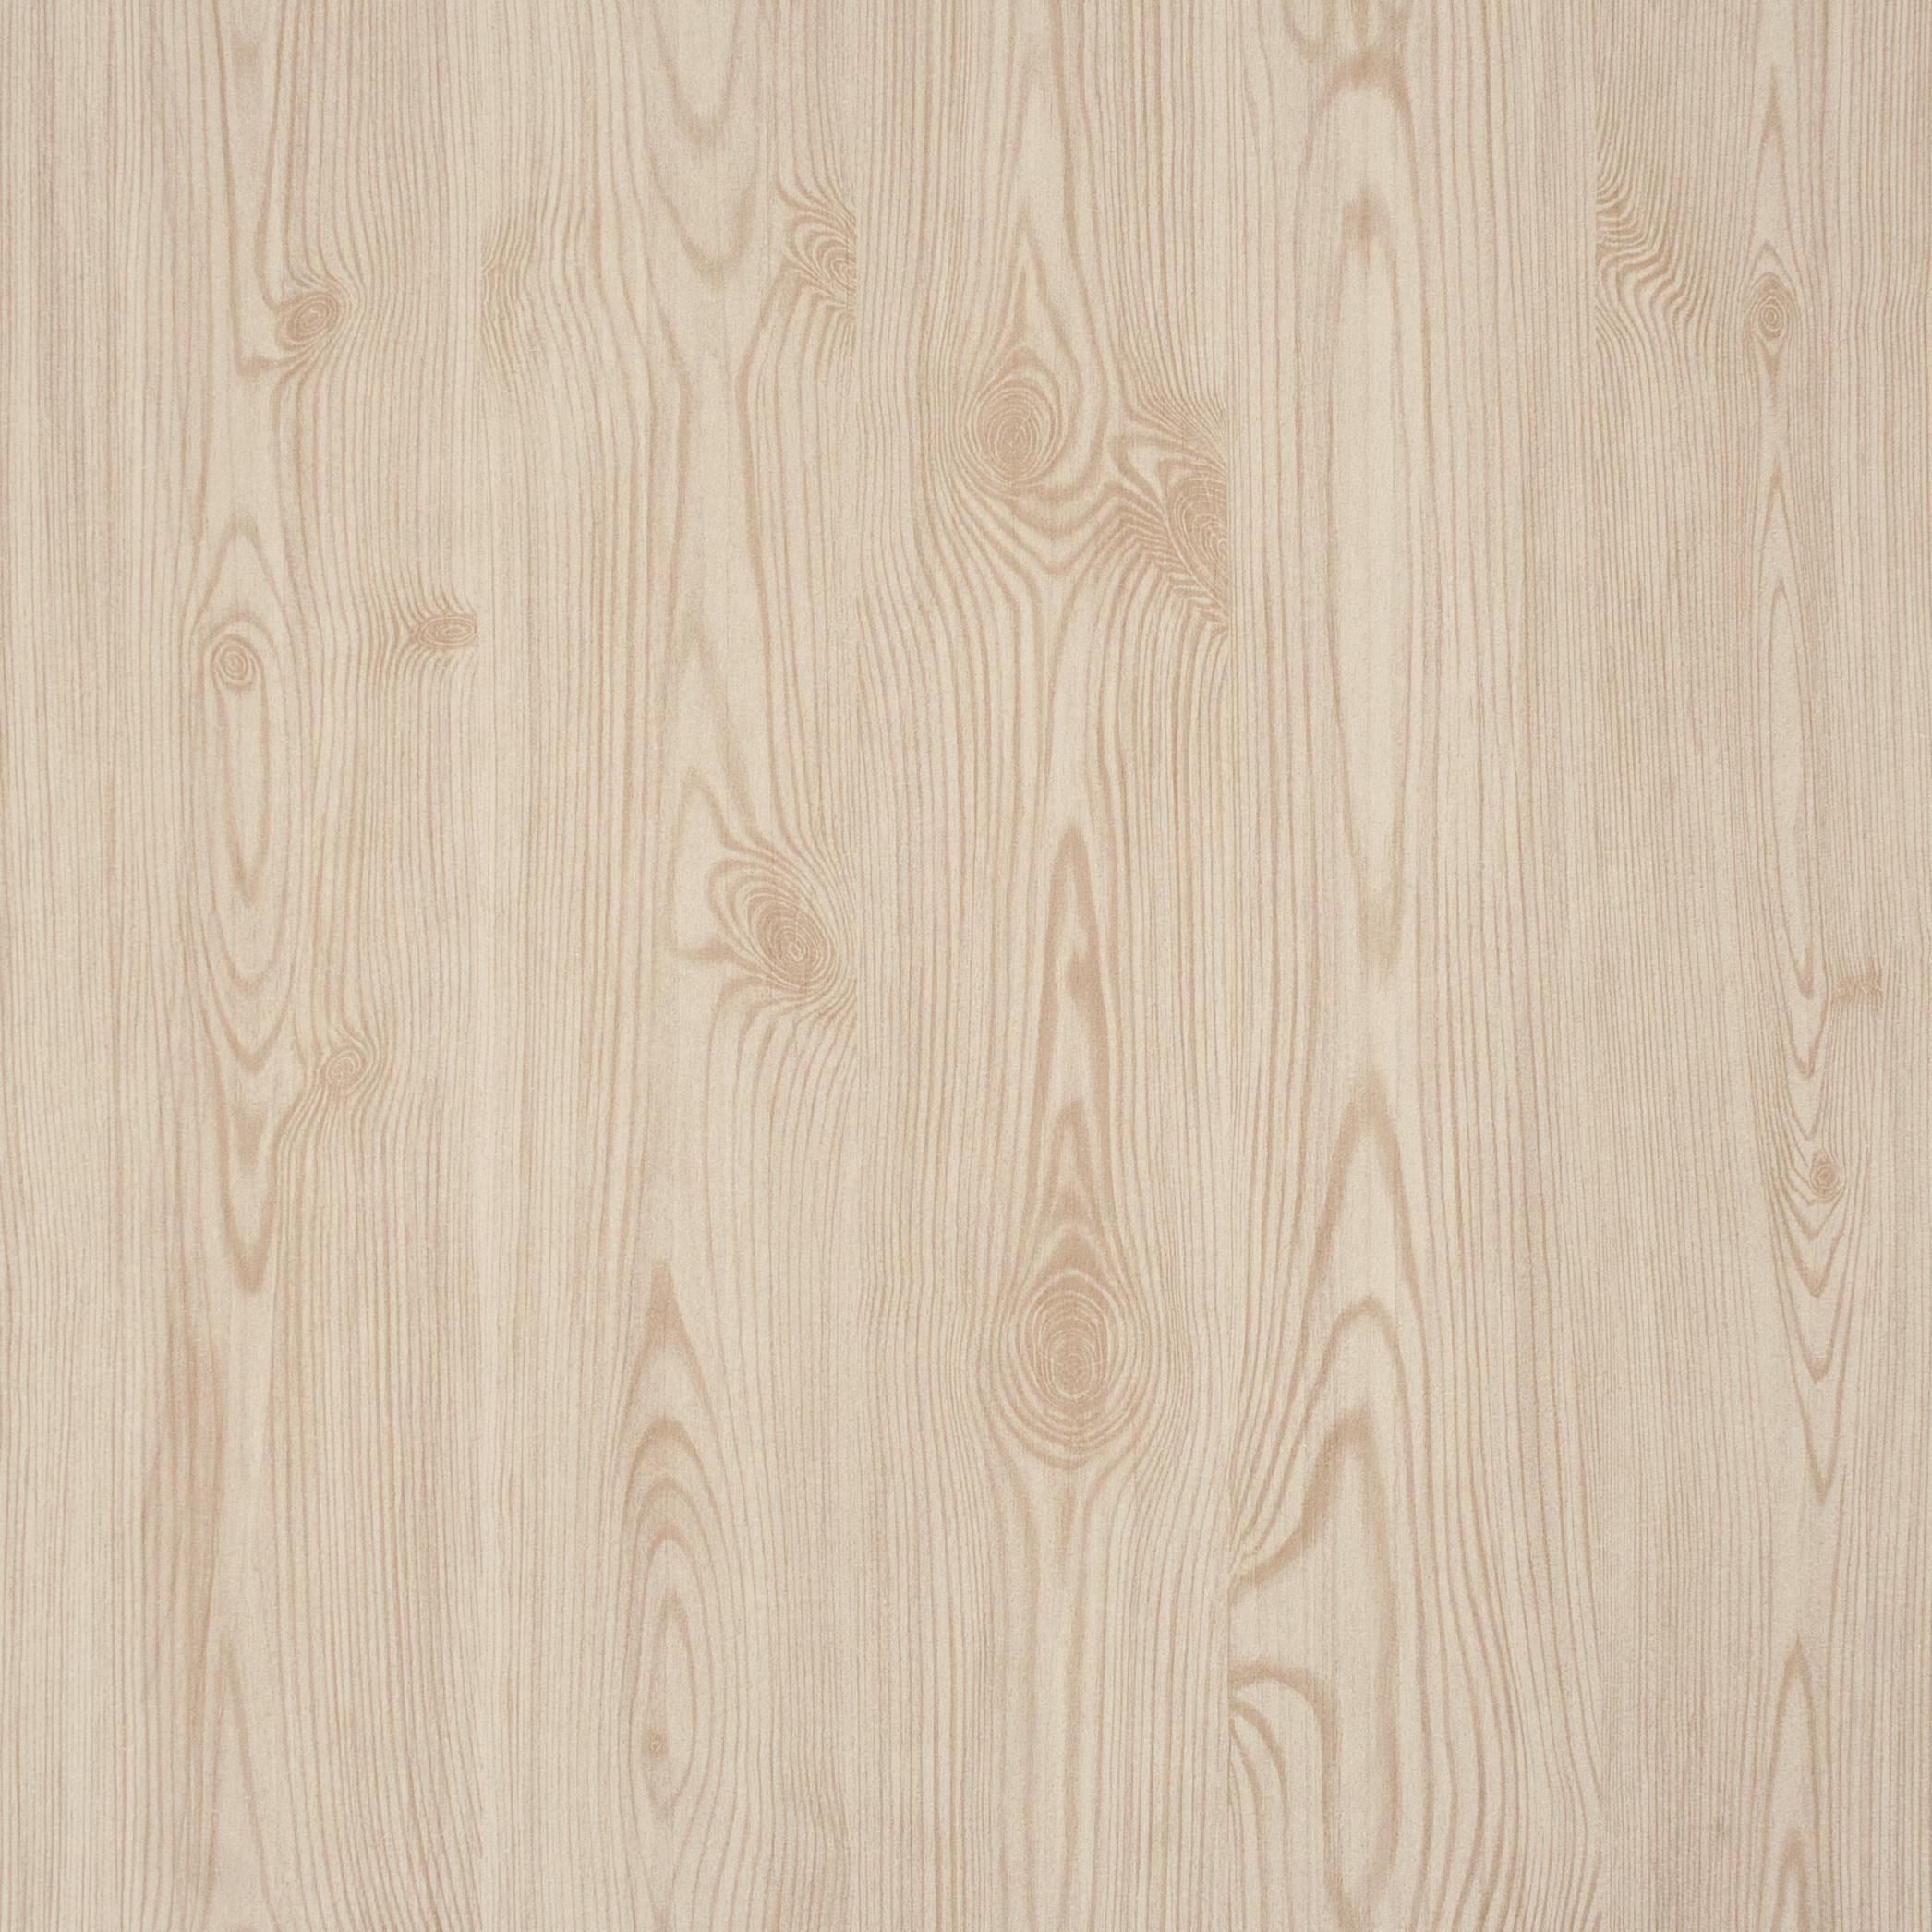 Wood Wallpaper brown / Hout Behang Bruin – Layers by Edward van Vliet 49050  – BN